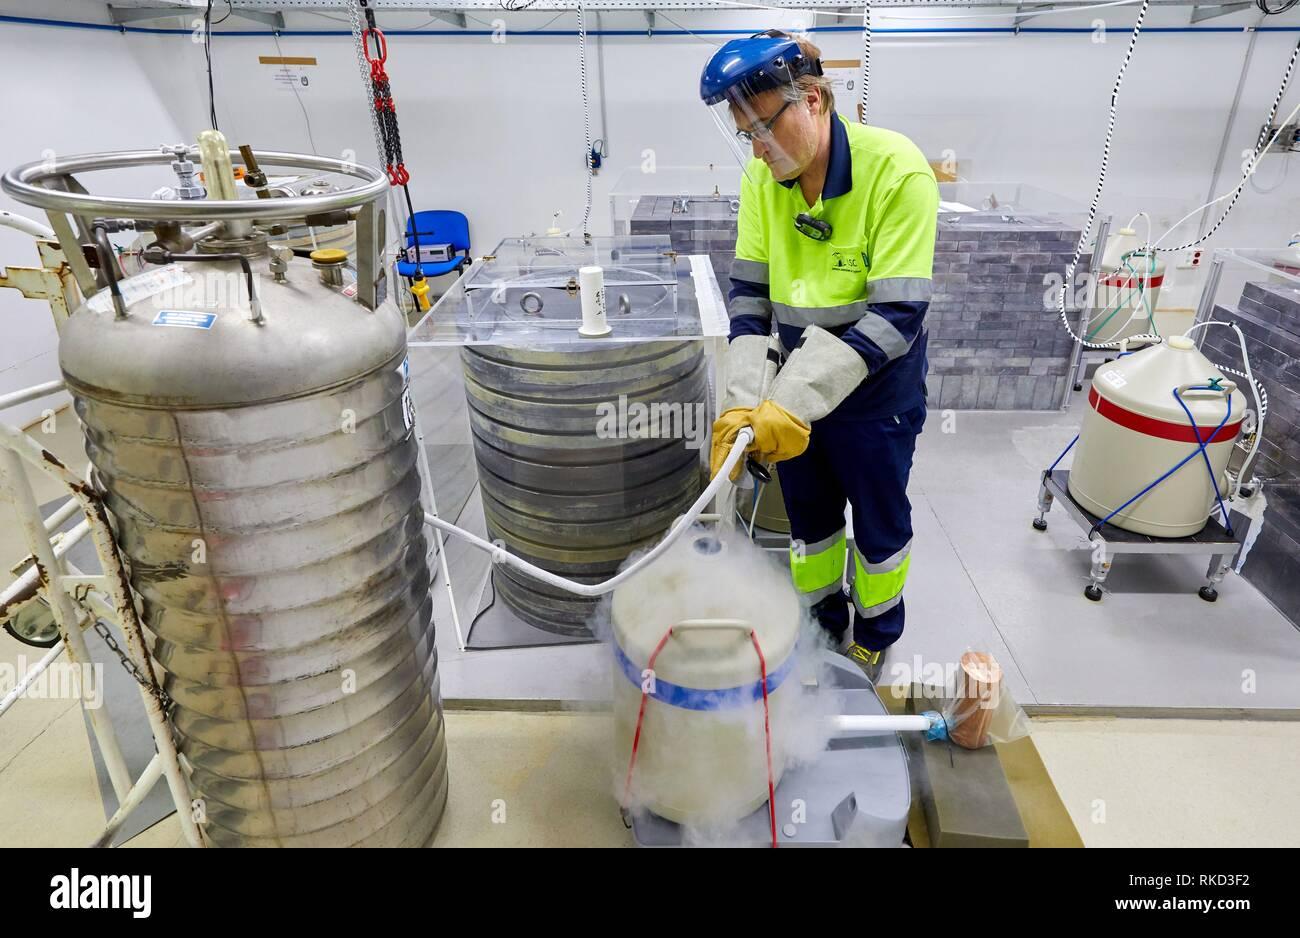 Liquid Nitrogen Refilling, Germanium Detectors, The Laboratorio Subterraneo de Canfranc (LSC) has been excavated in the rock 800 m deep under the - Stock Image